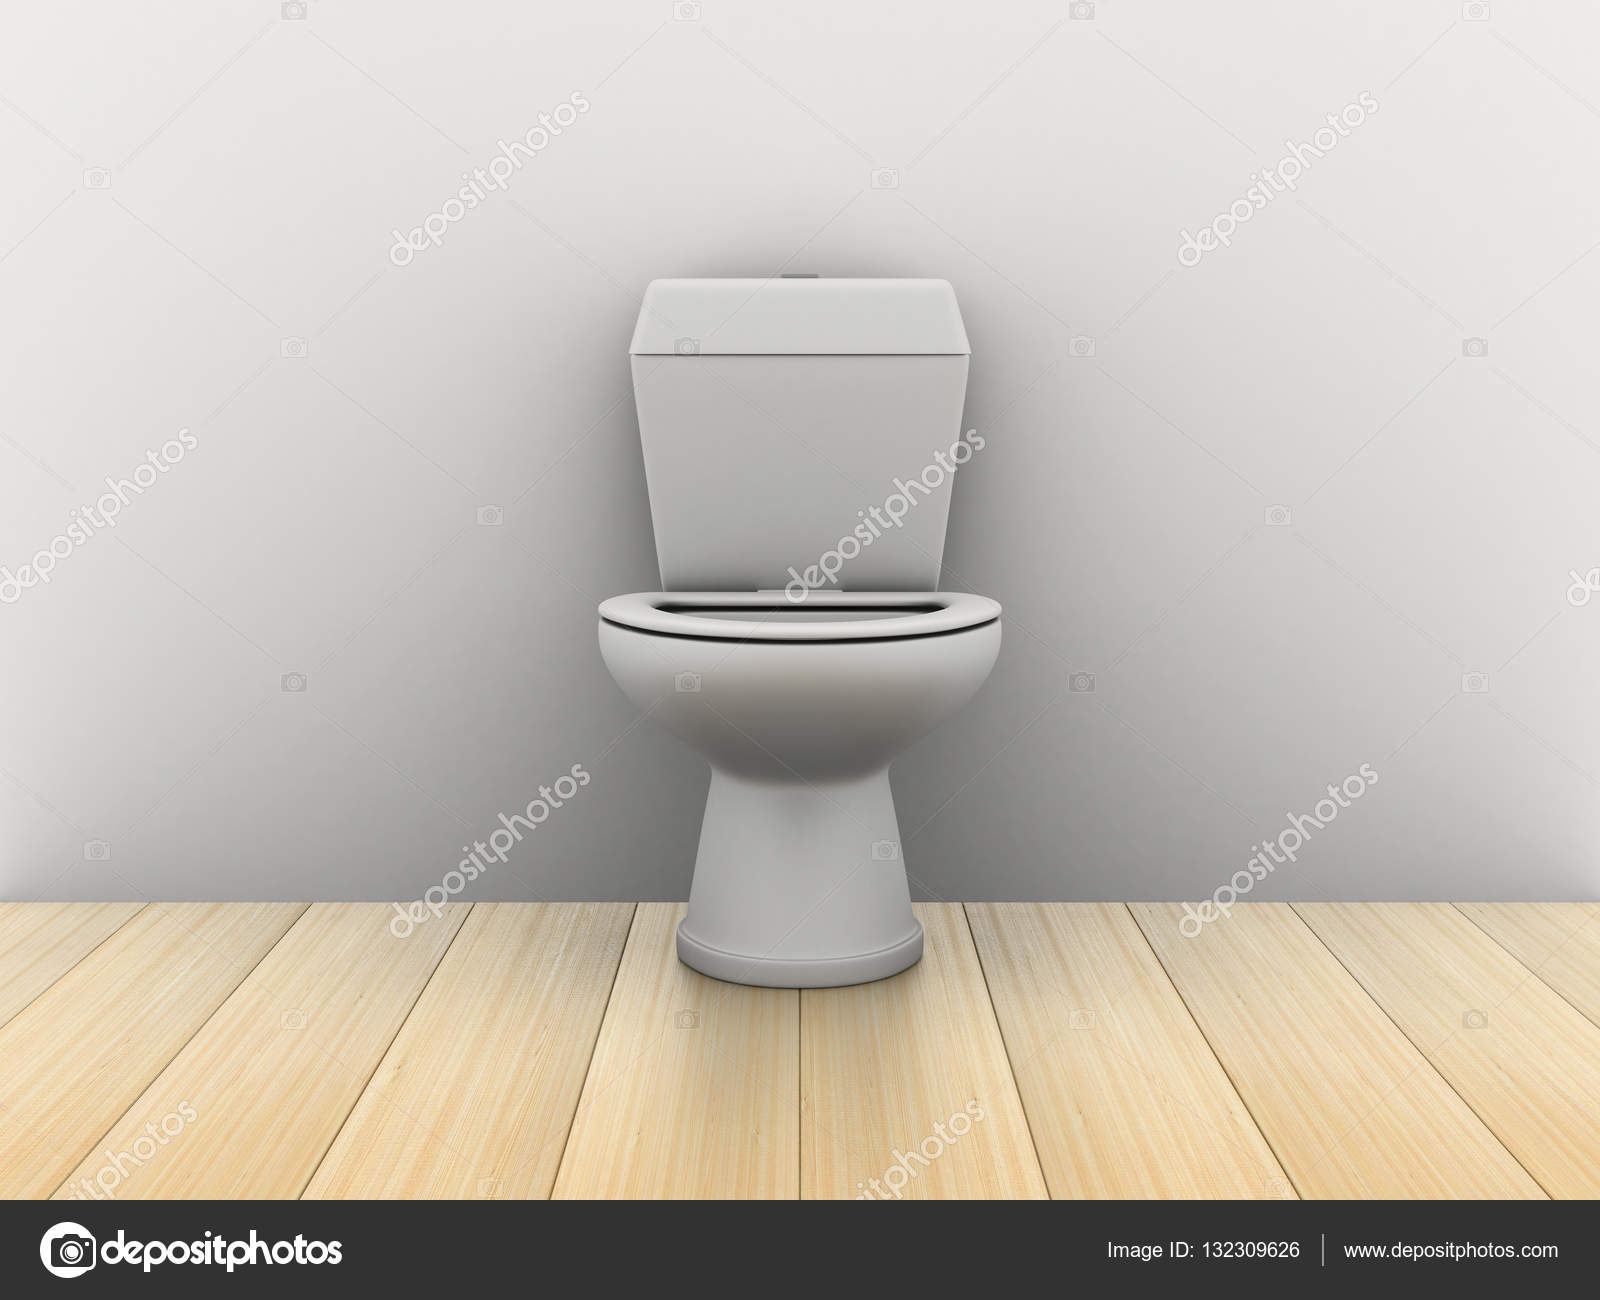 Kamer met water closet. 3d afbeelding u2014 stockfoto © isergey #132309626